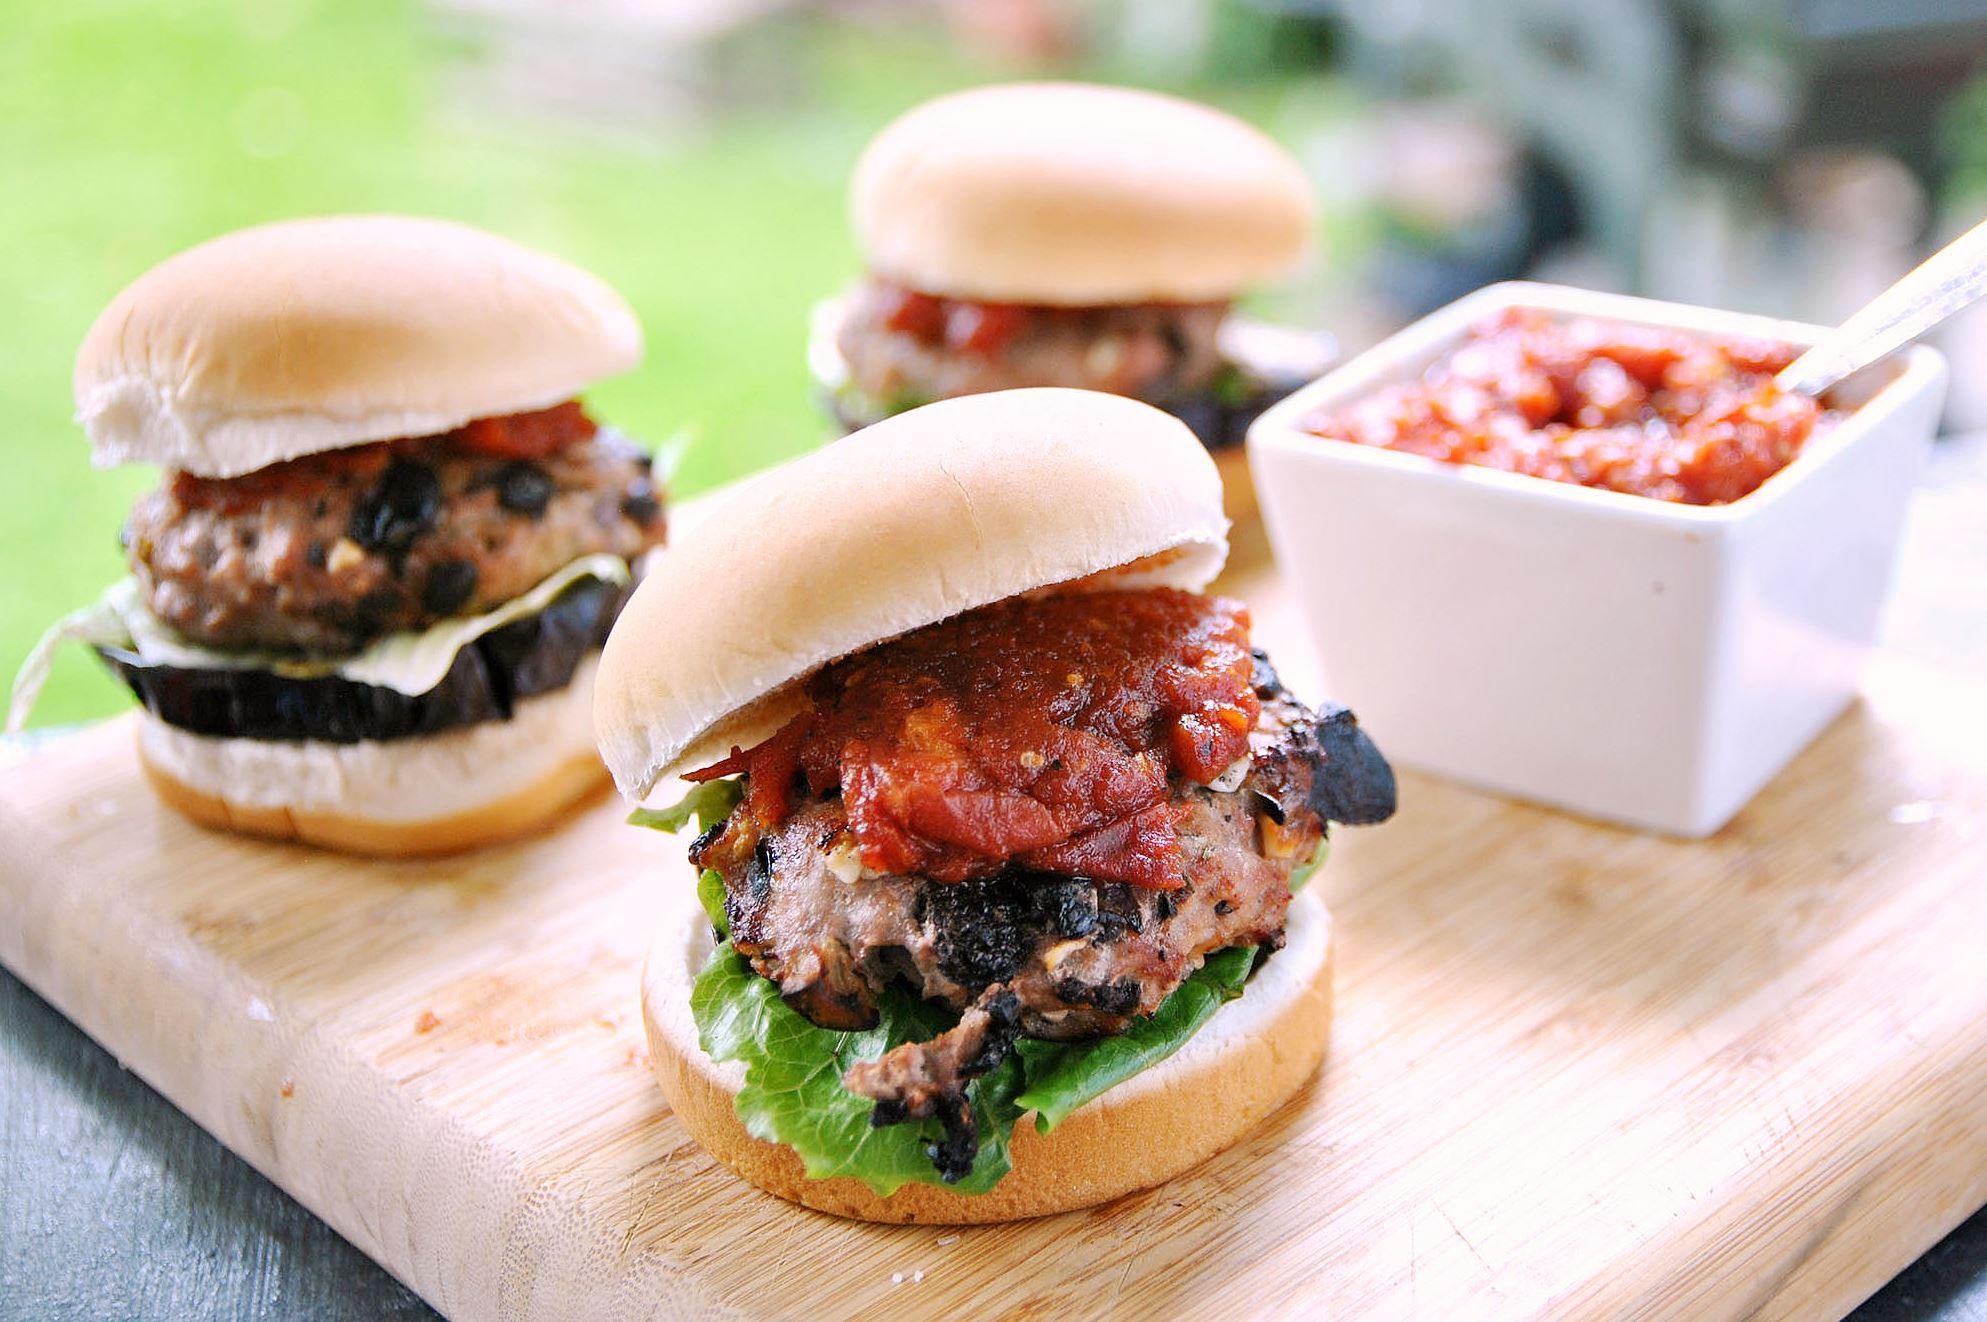 letseat0730-turkey-feta-05-2 Turkey-Feta Burgers with Tomato Jam.